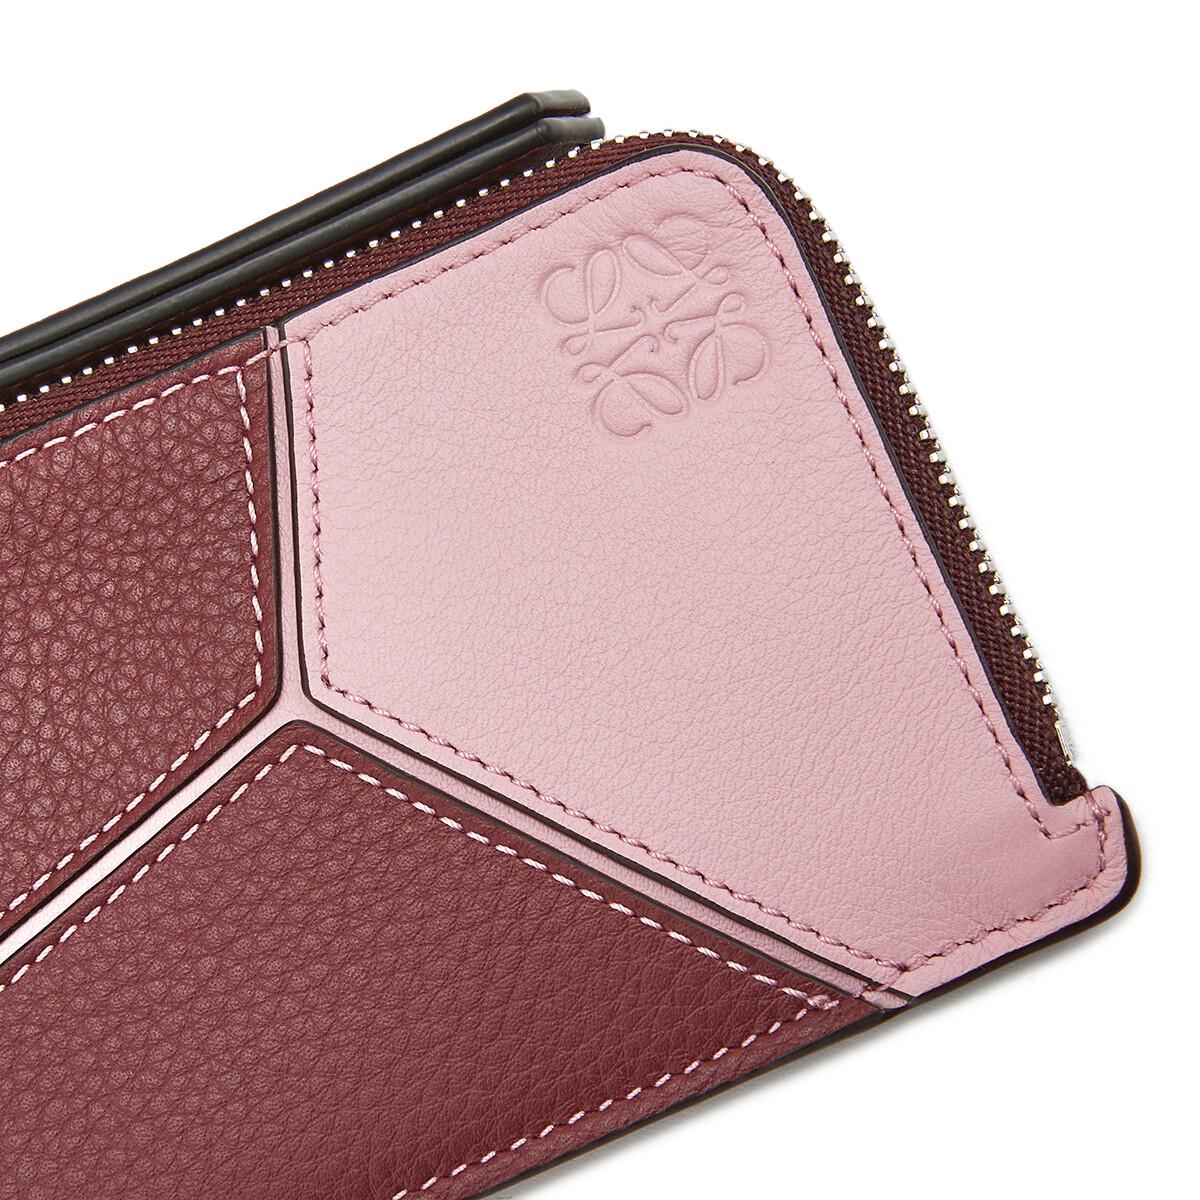 LOEWE Puzzle零钱卡包 Wine/Pastel Pink front